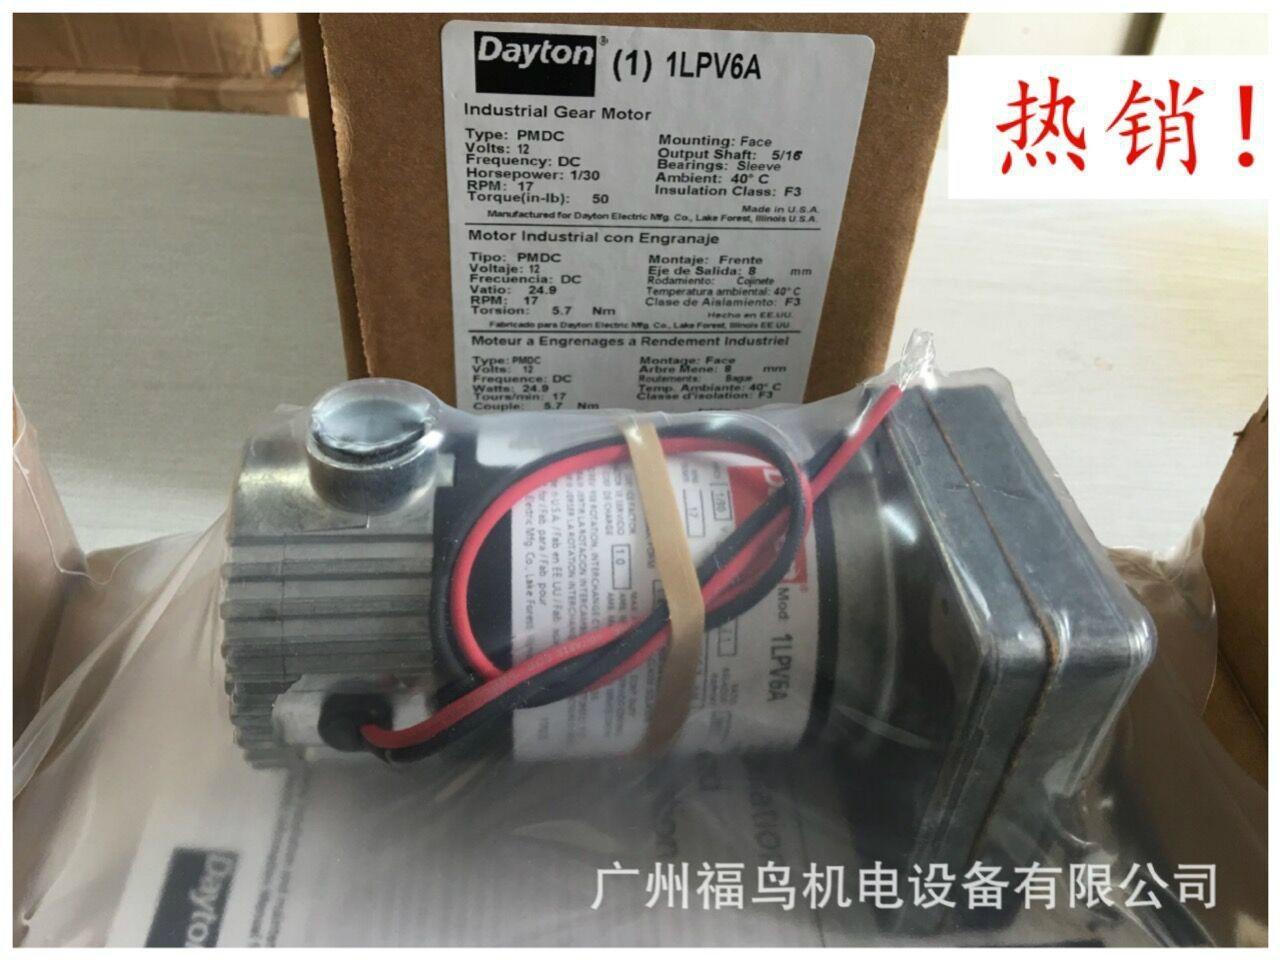 DAYTON電機, 馬達, 型號: 1LPV6A, 1LPV6